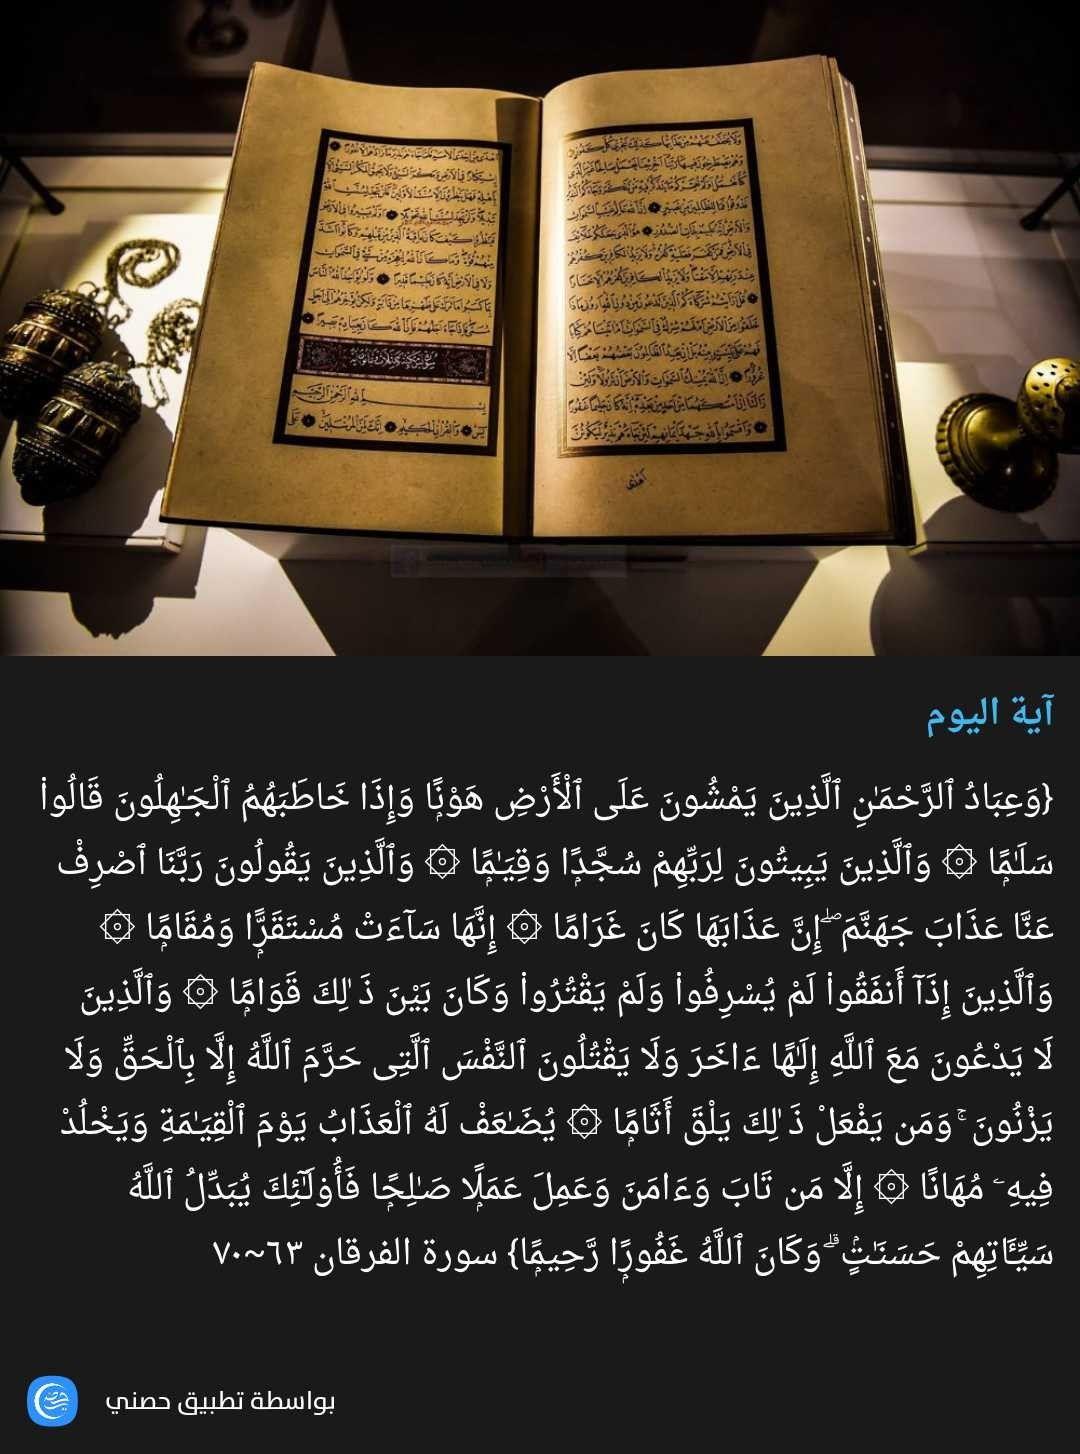 Pin By Blackeyeem On الآيات القرآنية والحديث Quran Quotes Quotes Cards Against Humanity